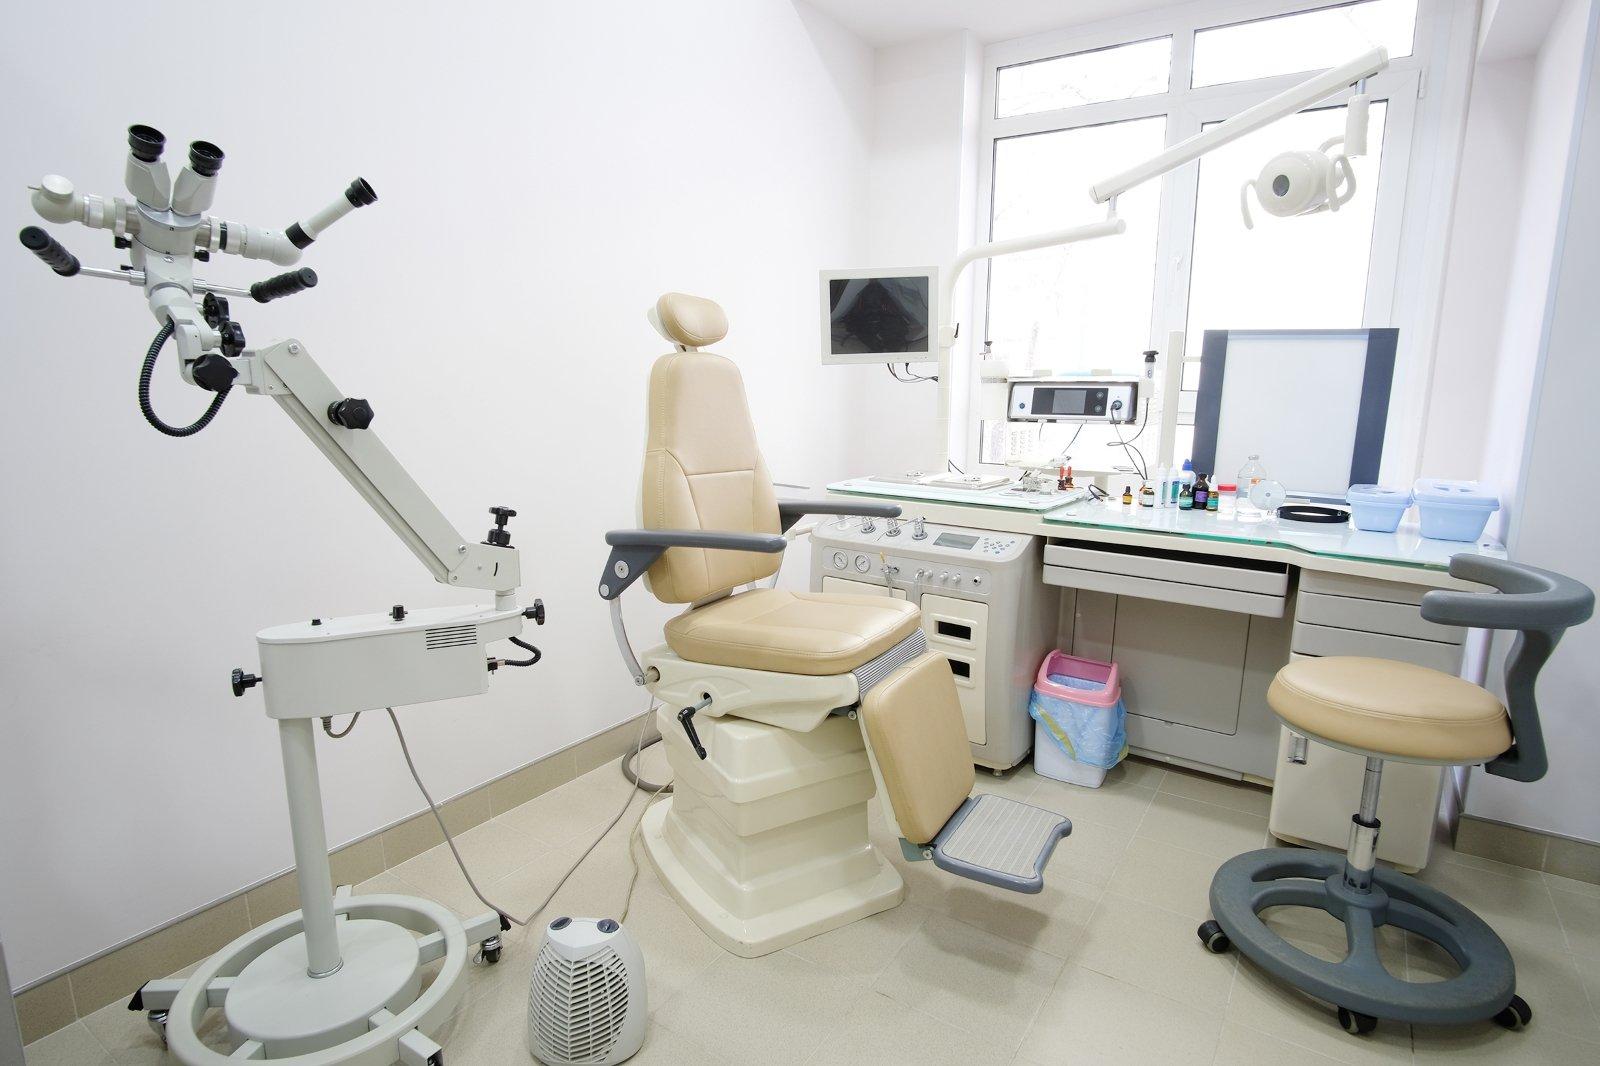 Sedia del dentista